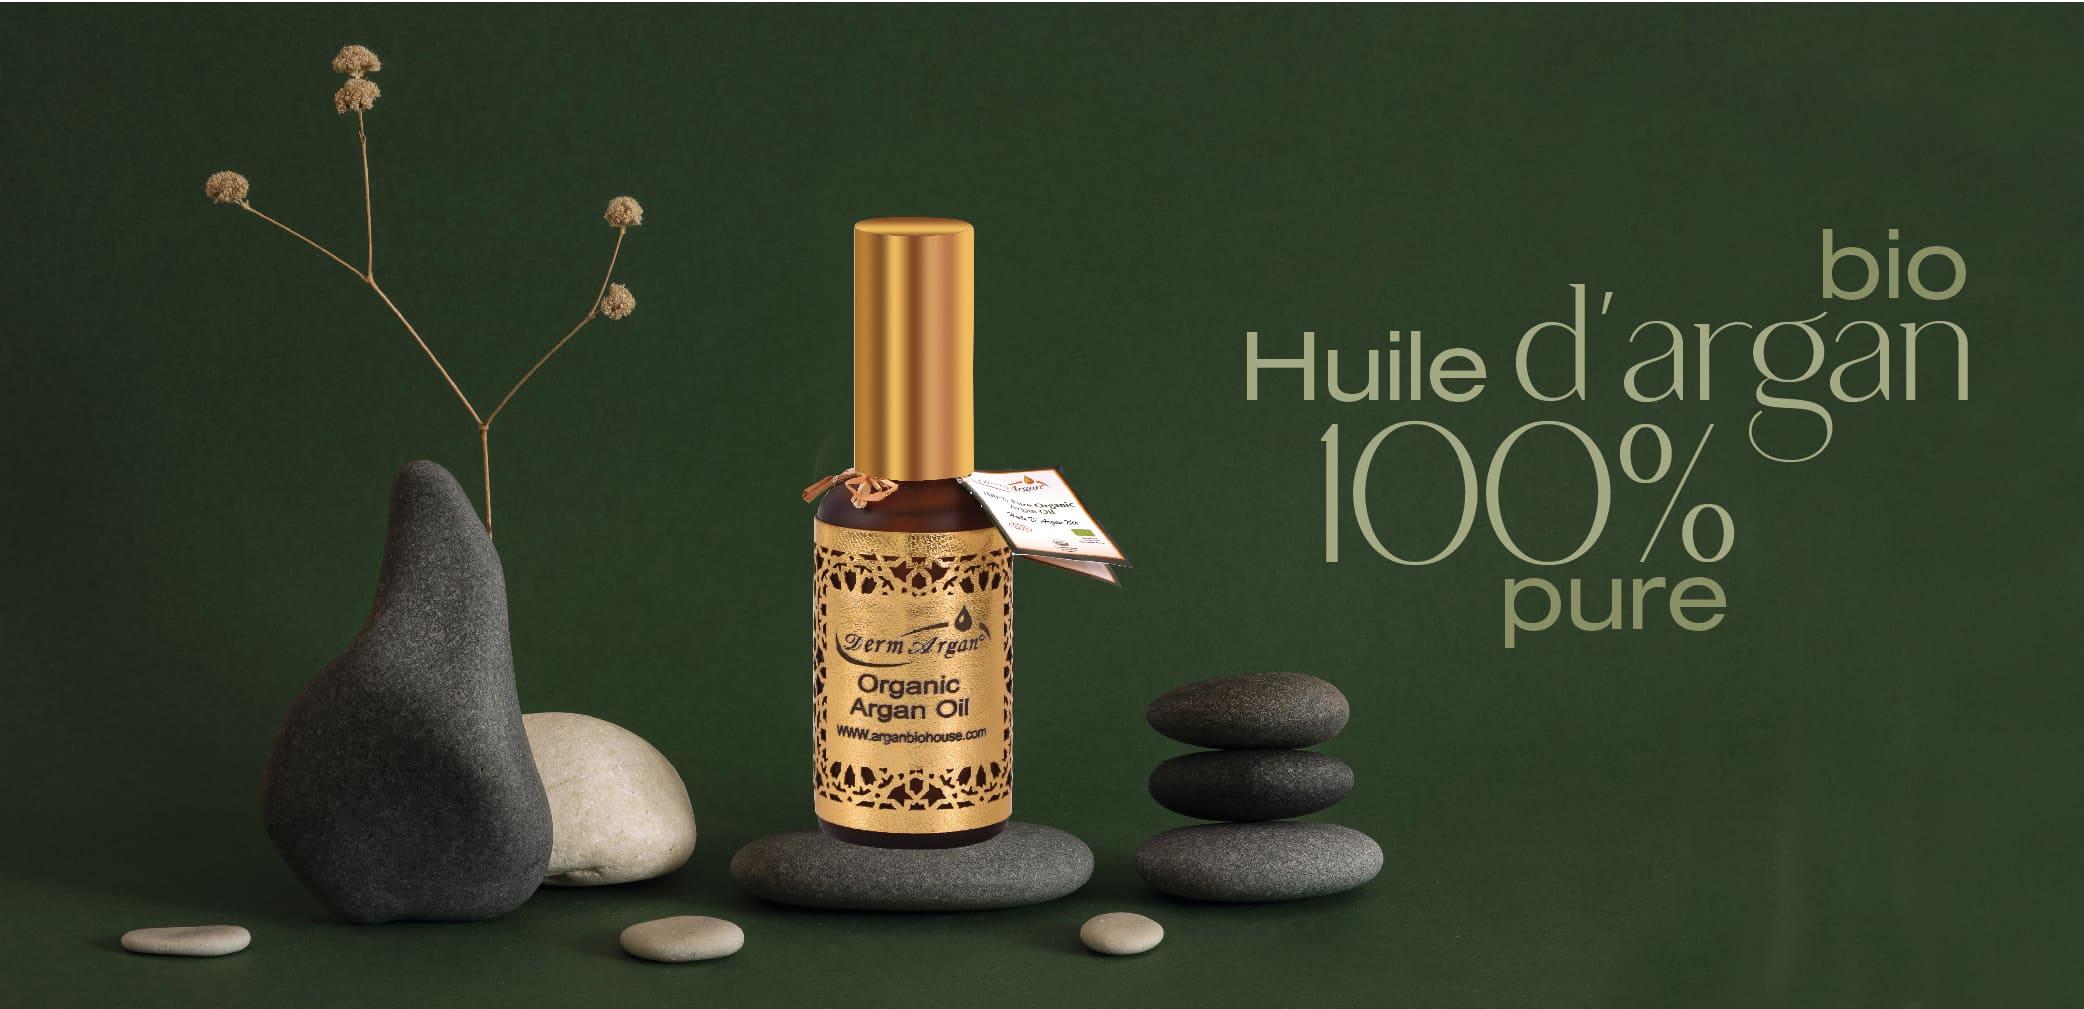 Huile d'argan 100%</br> Pure & Bio